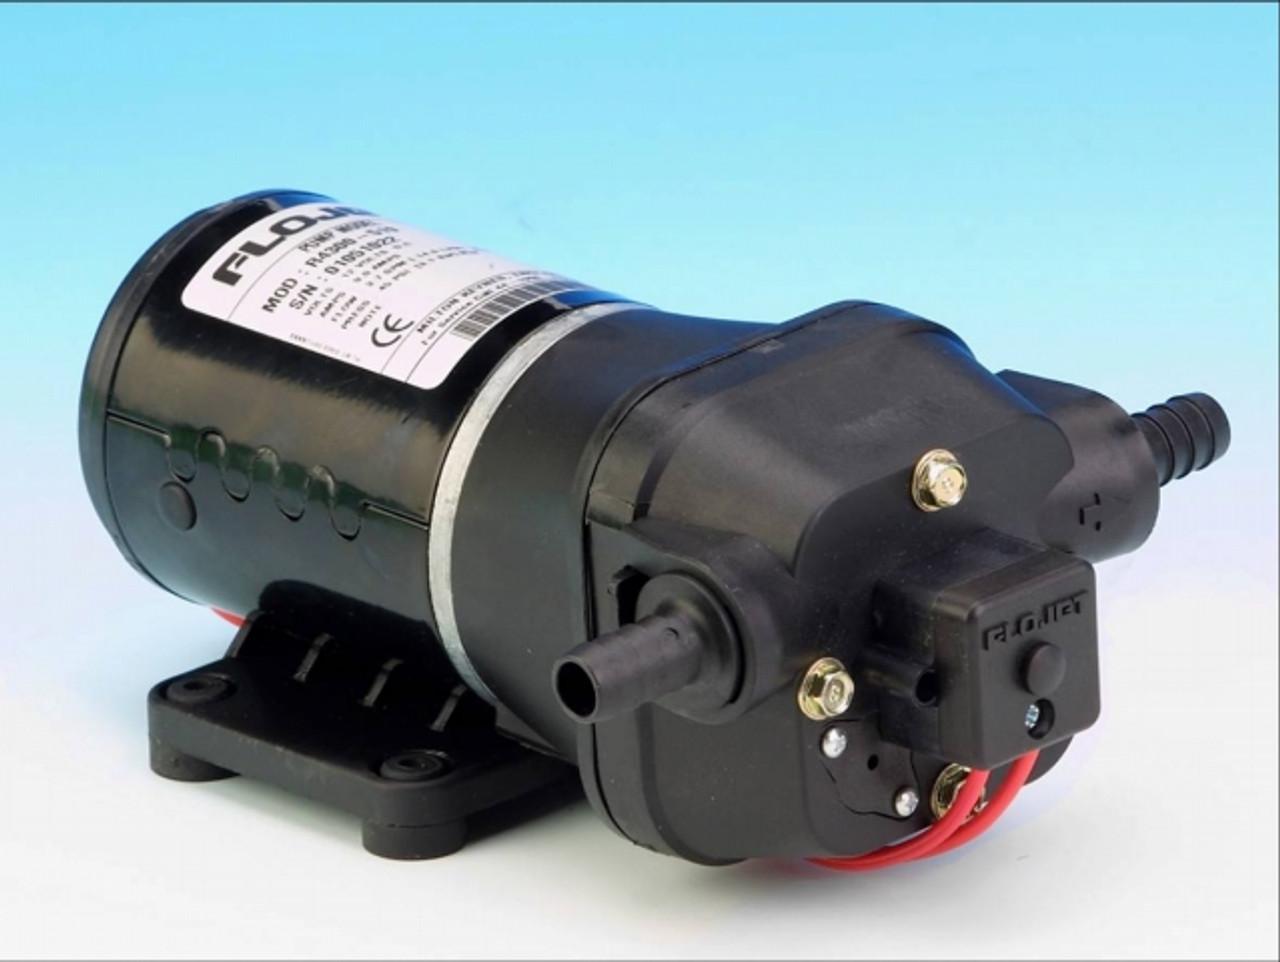 "IW4406-143 Flojet ""Quiet Quad"" Pressure Pump 12v DC with Bypass (Santoprene/EPDM) 12.5 L/Min Max"